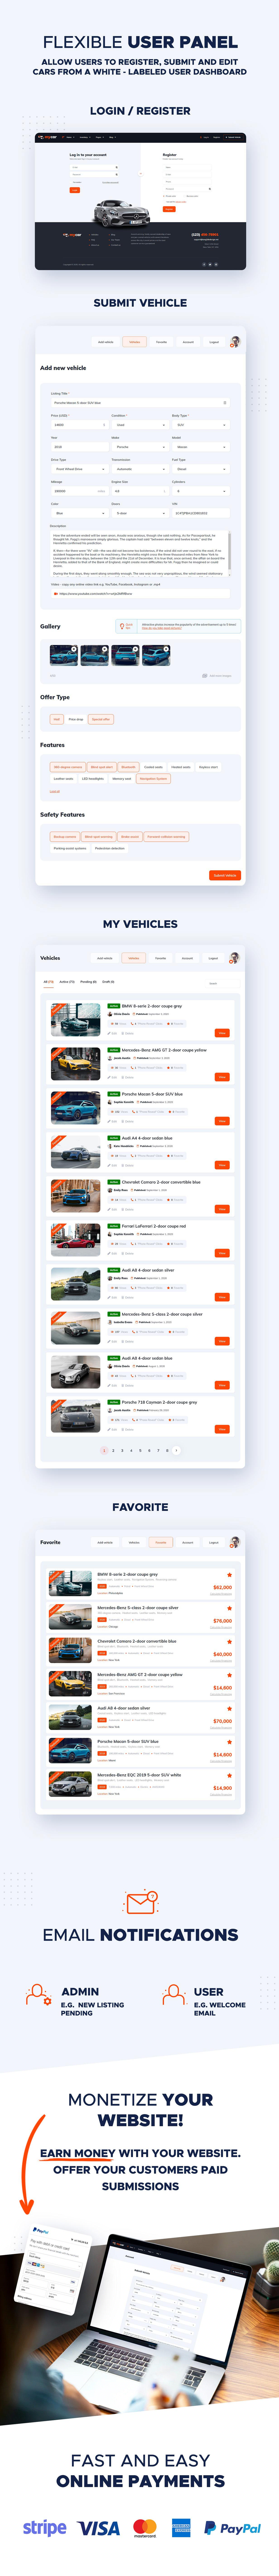 Vehica - Car Dealer & Automotive Directory - 10